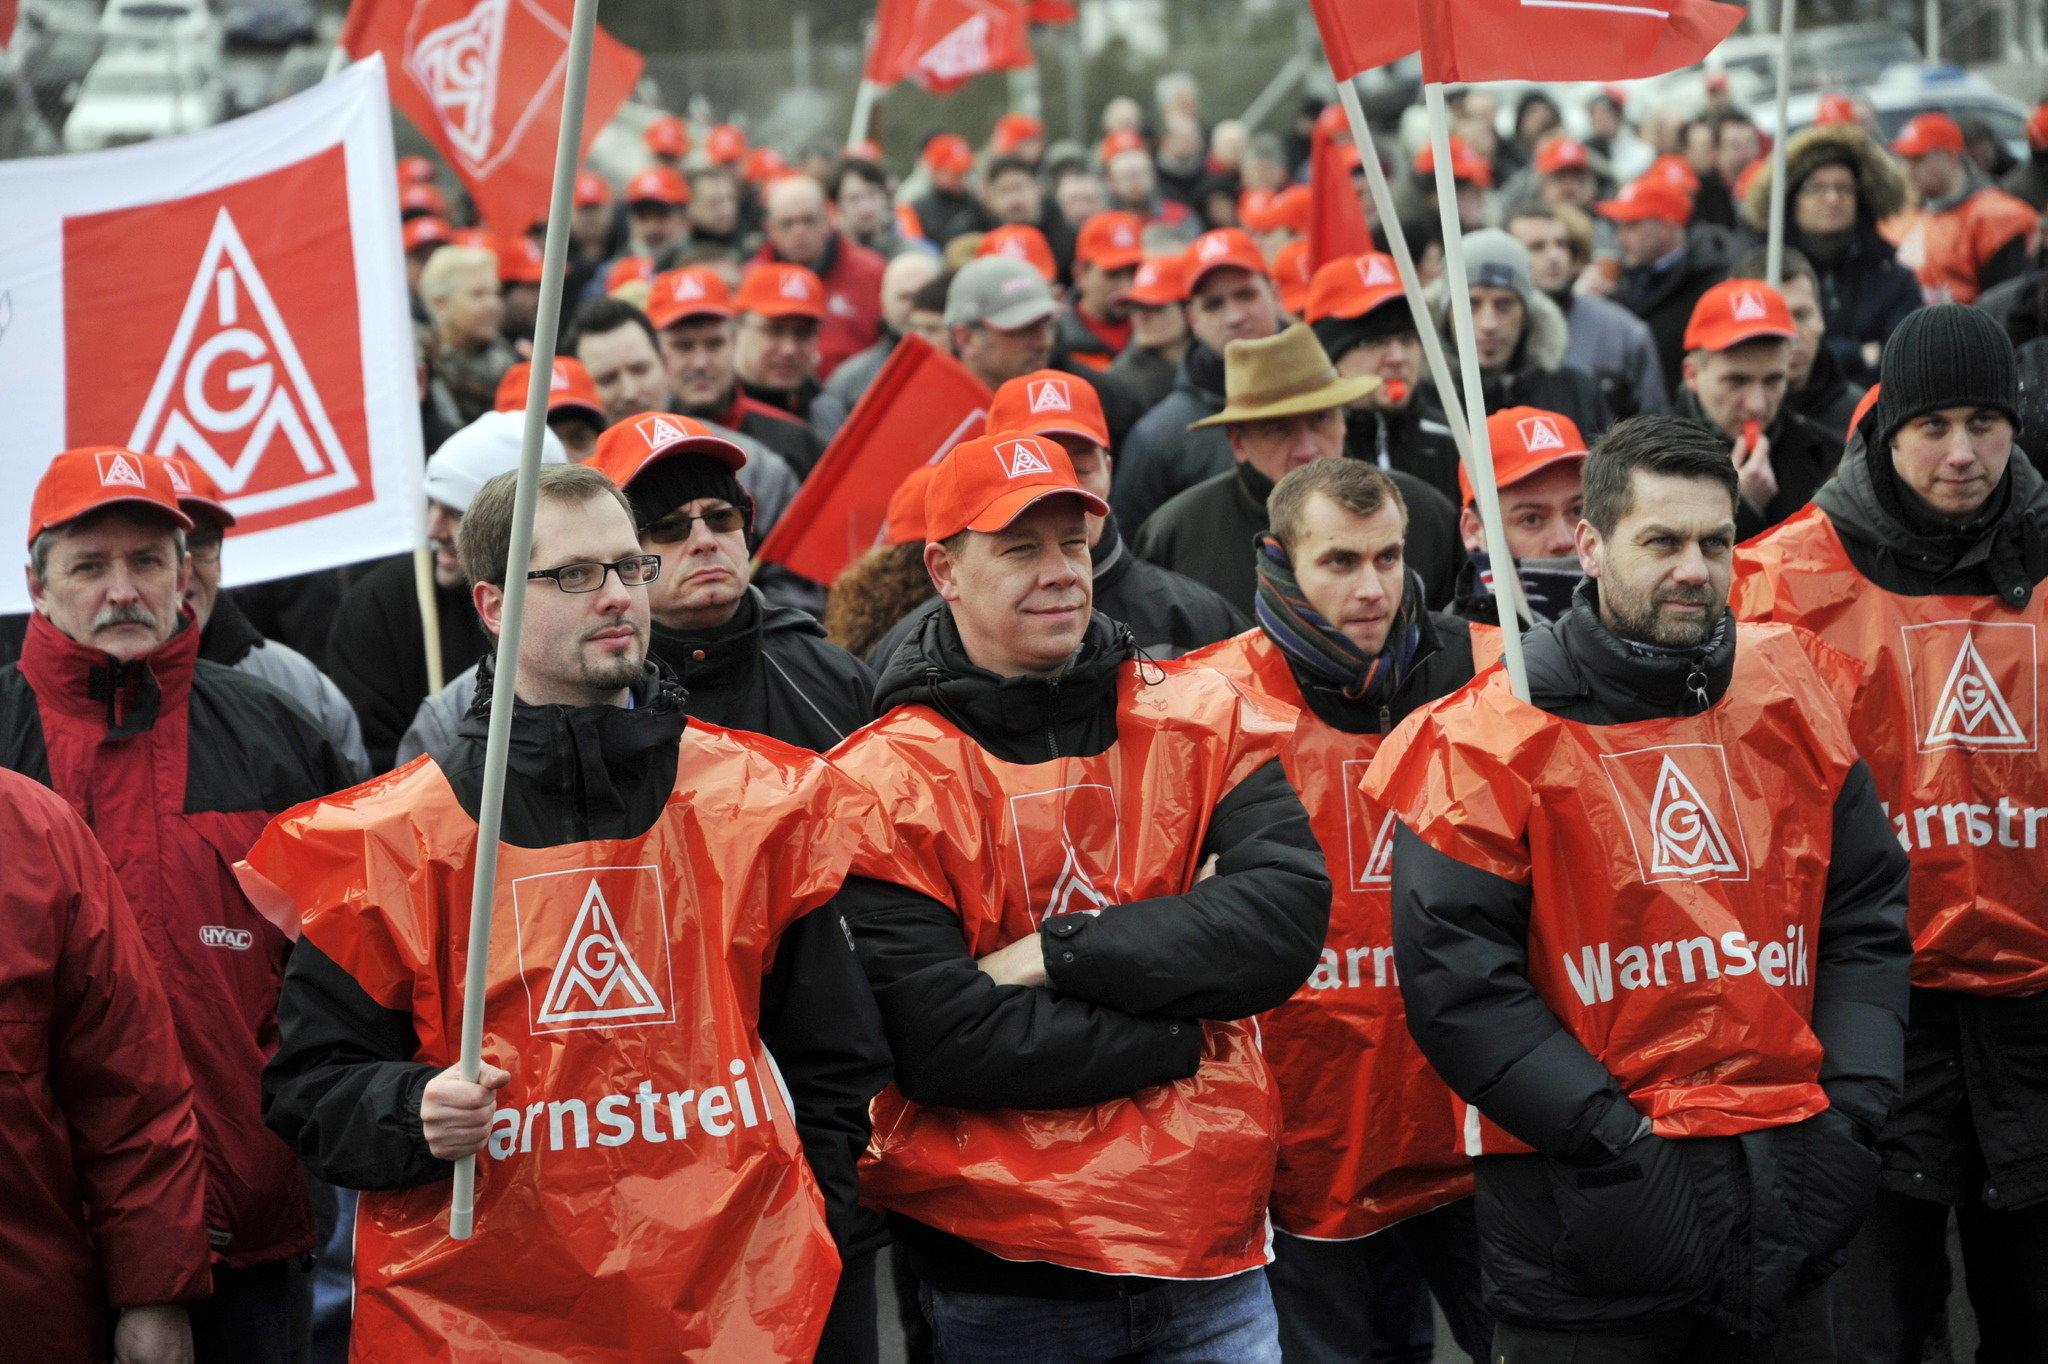 H Γερμανία ανατρέπει το εργασιακό τοπίο με 28 ώρες δουλειά την εβδομάδα και επιπλέον 102 ημέρες άδεια την 2ετια